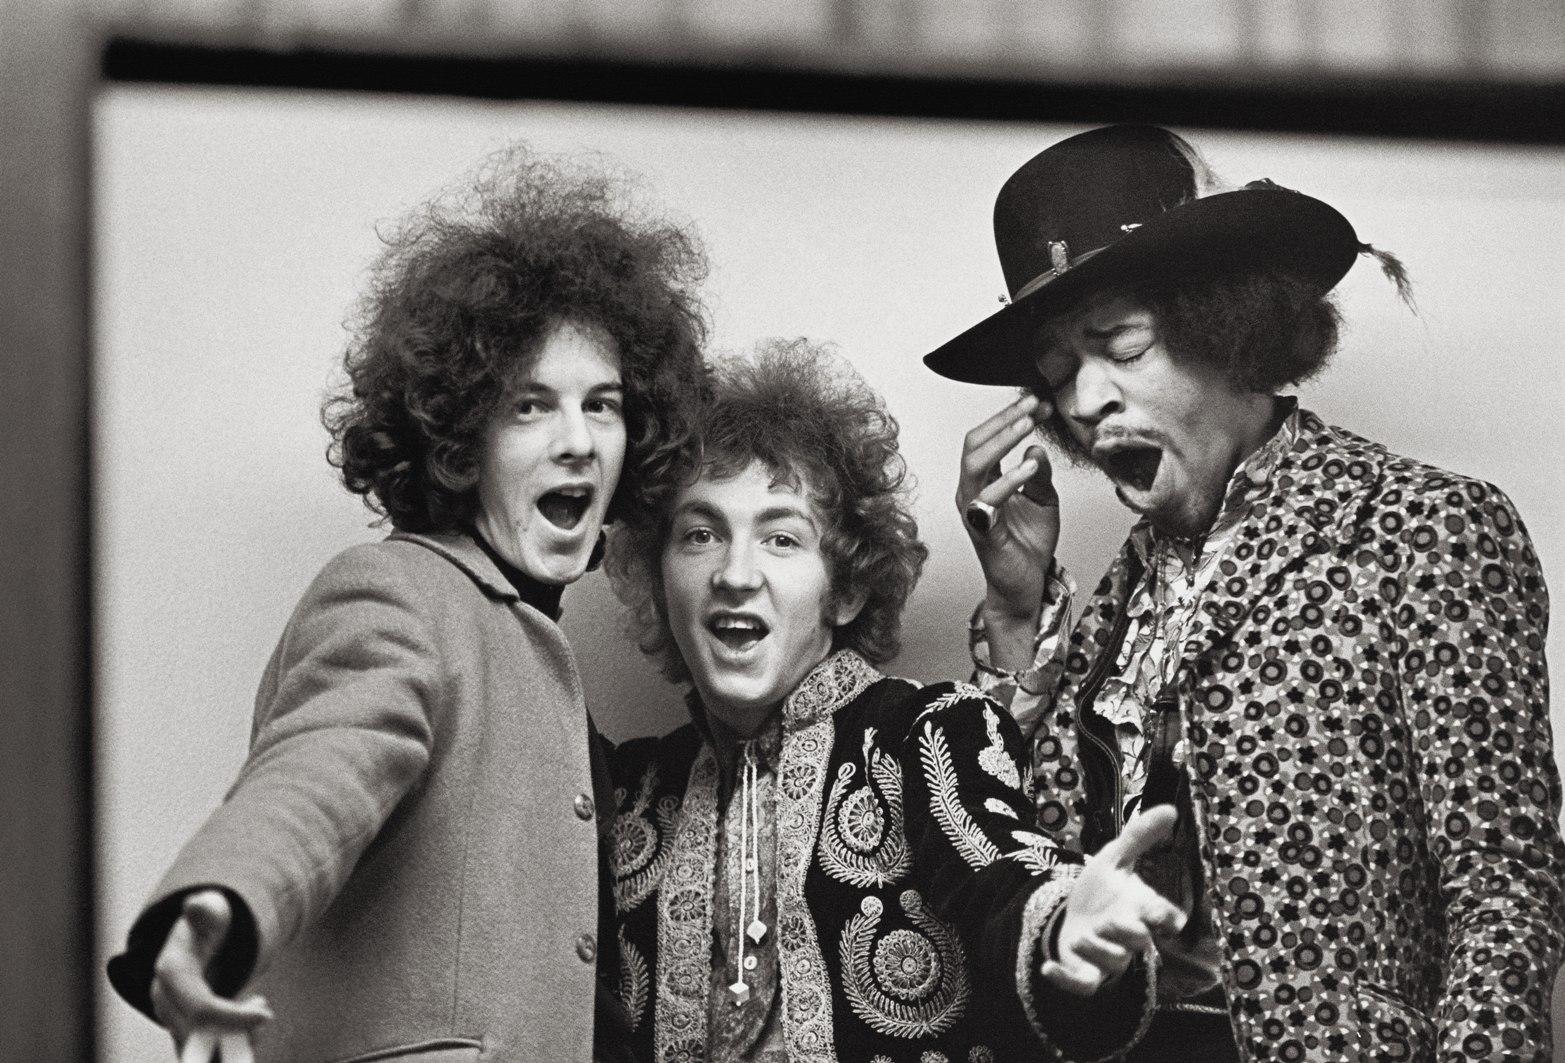 Jimi Hendrix Experience, The - The Jimi Hendrix Experience